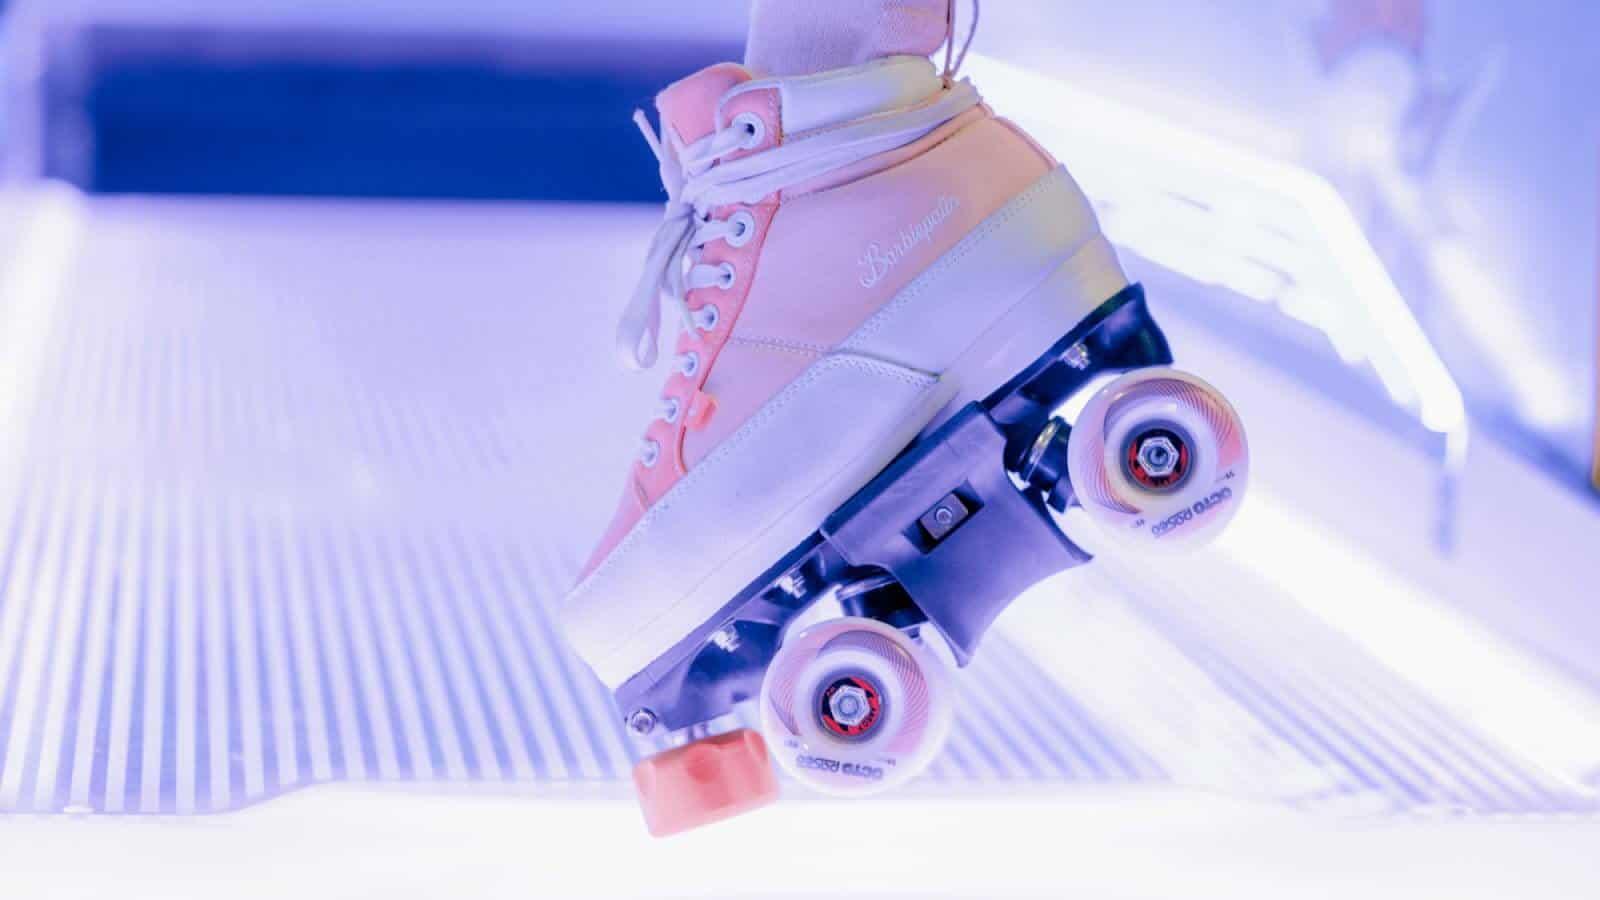 CHAYA Kisment Barbiepatin Park Roller Skates